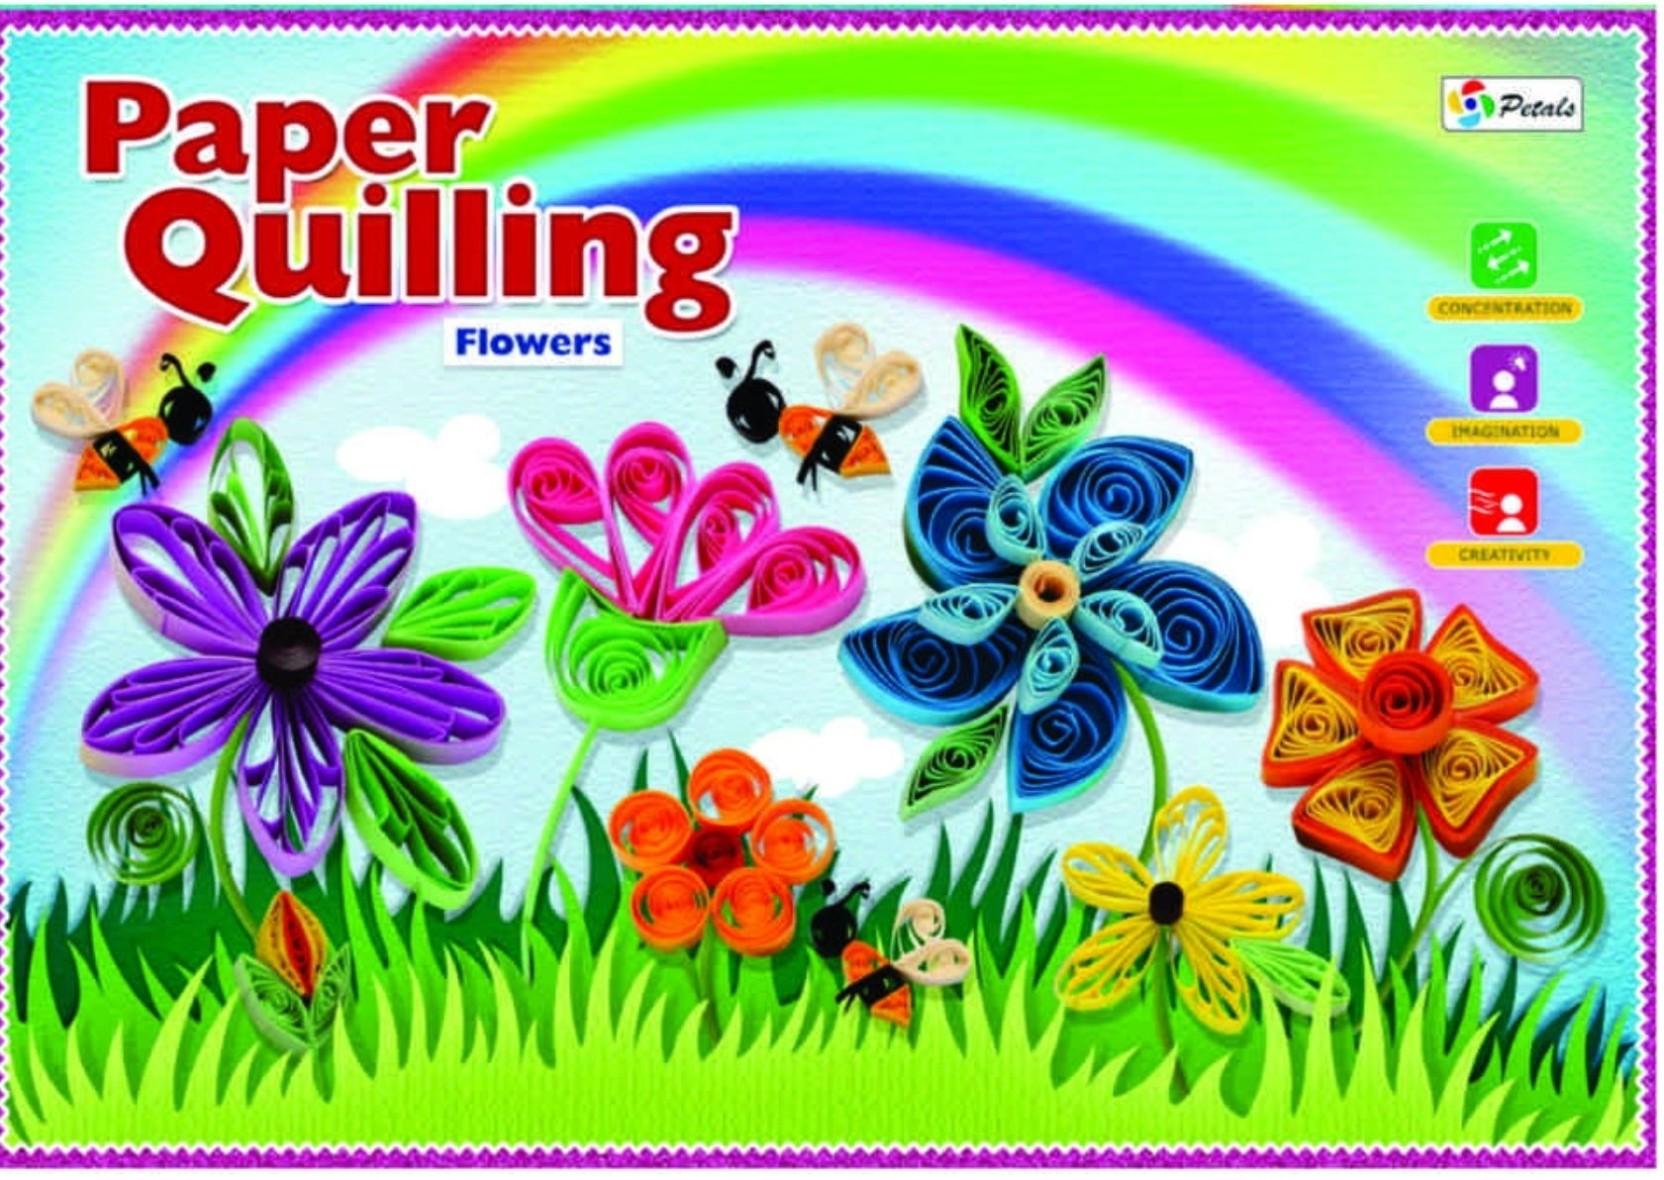 Petals Paper Quilling Flower Paper Quilling Flower Shop For